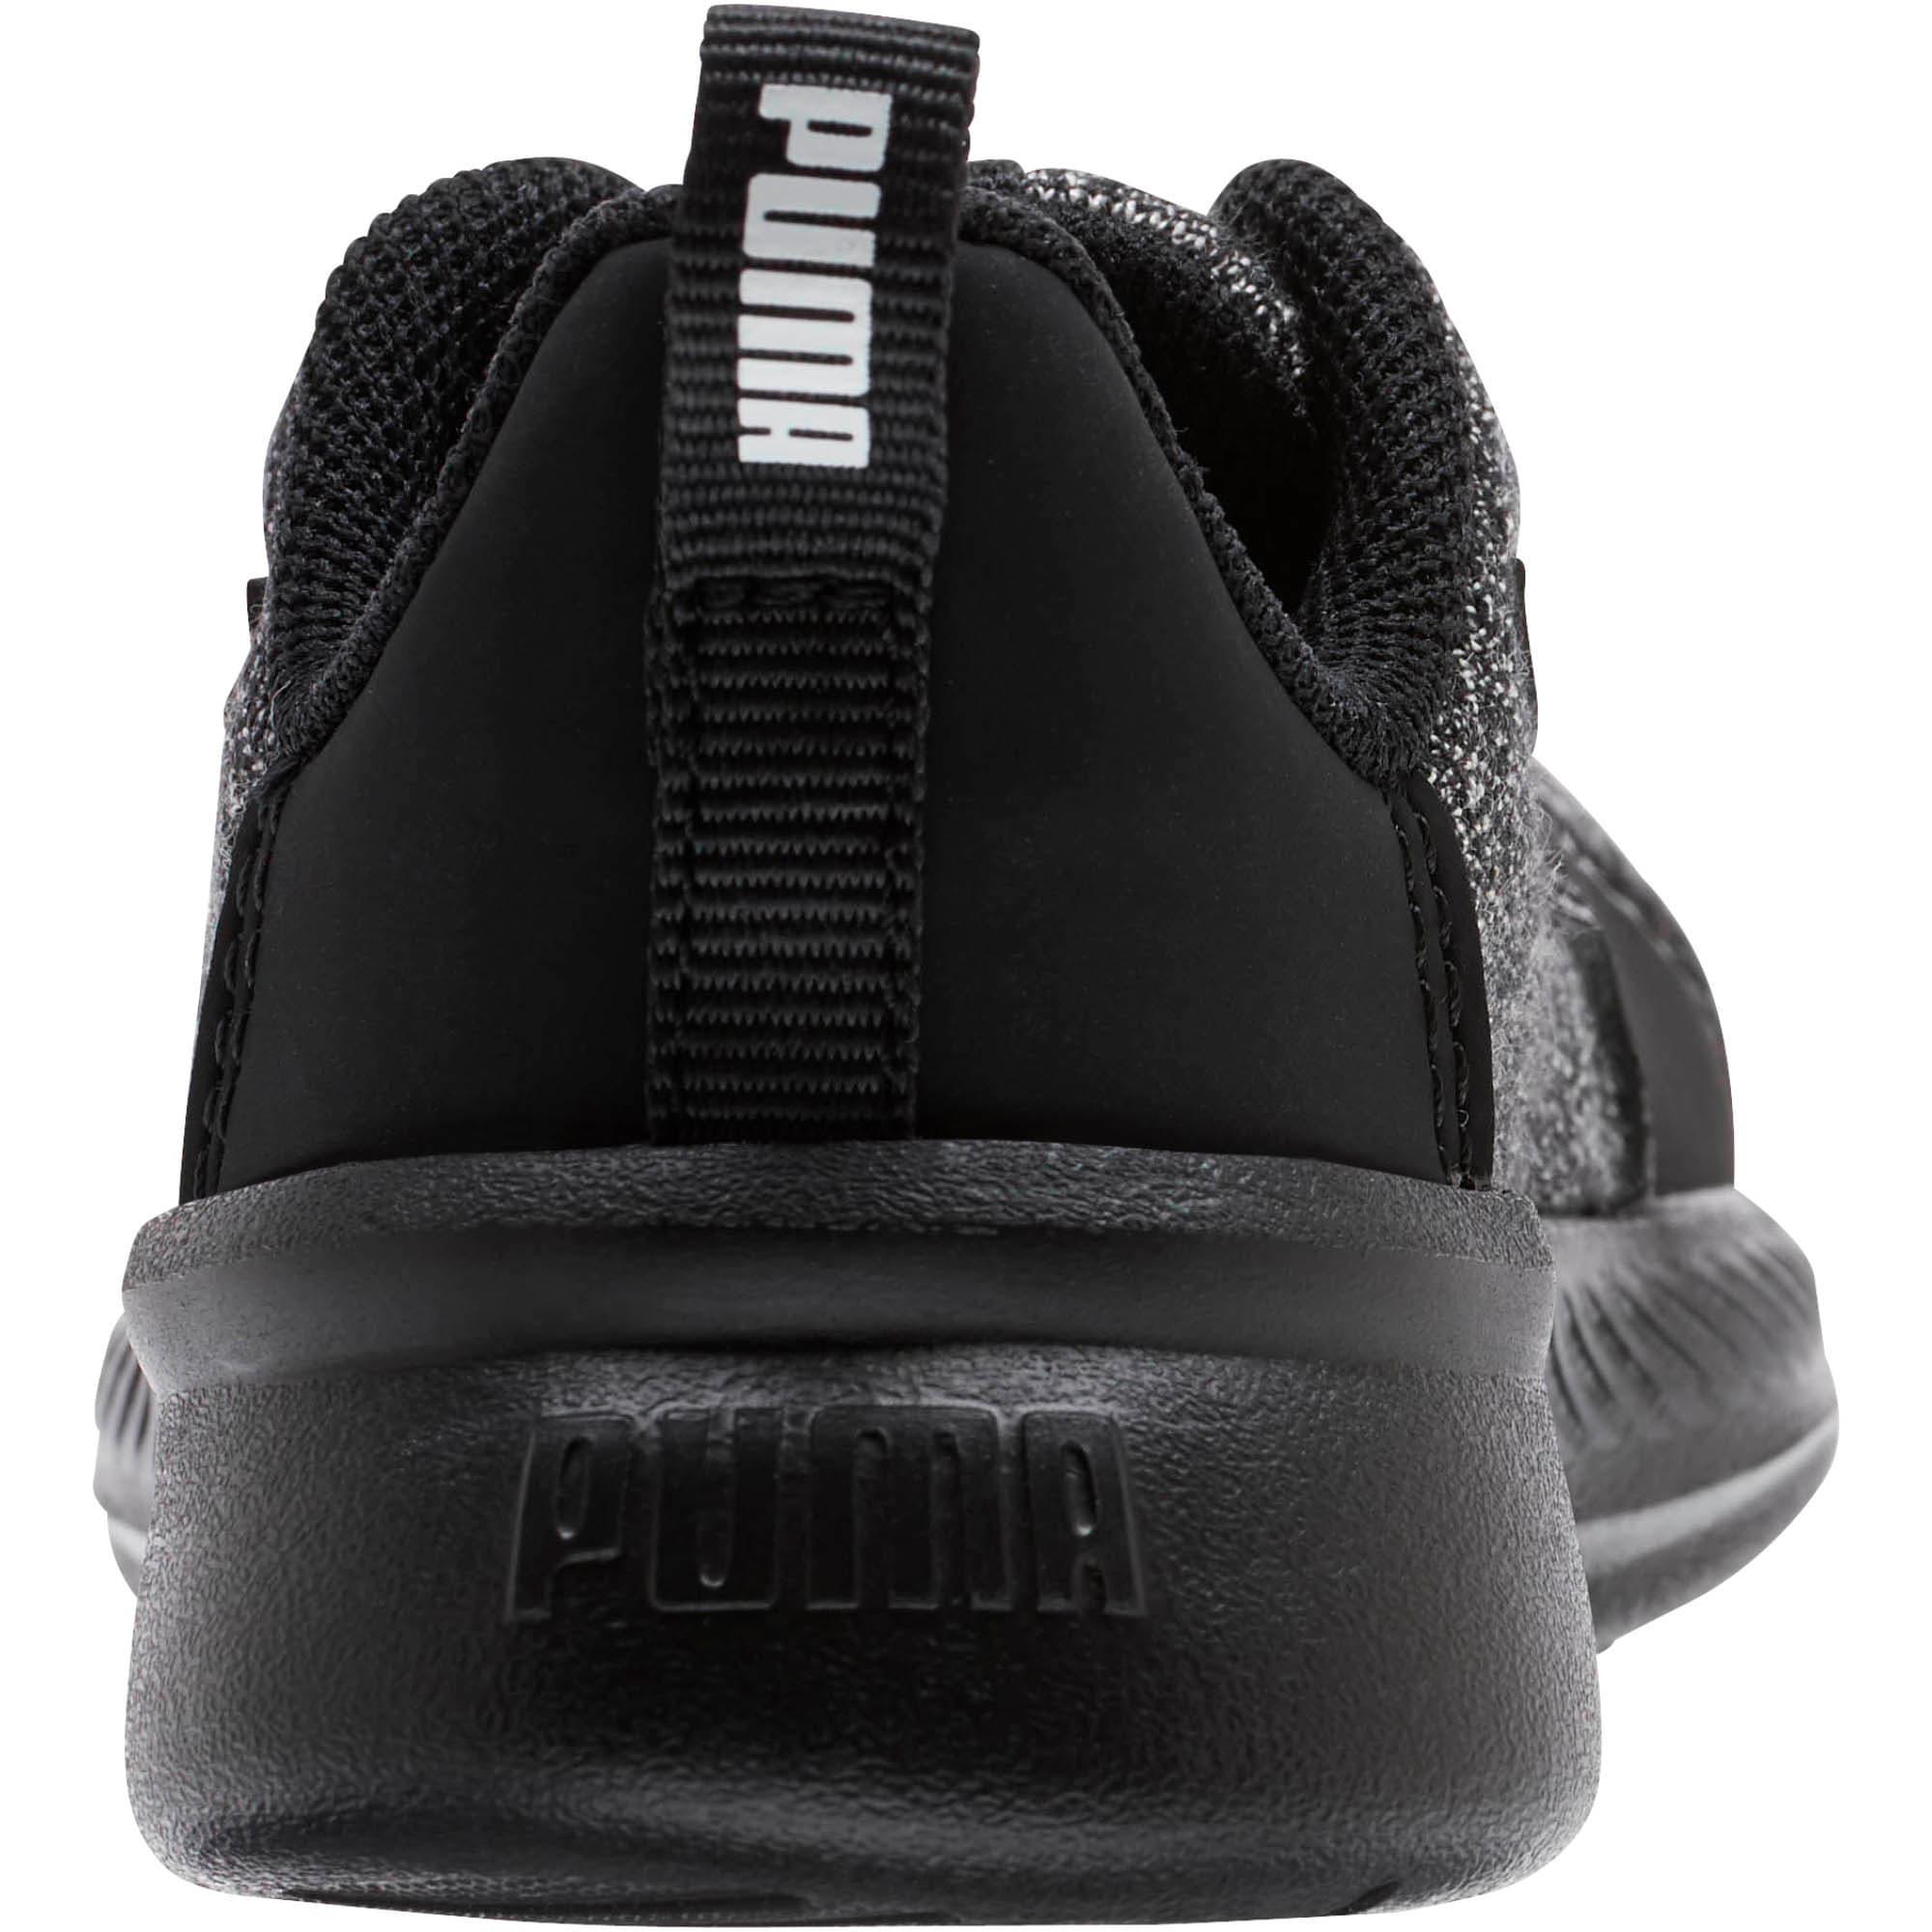 Thumbnail 3 of Tishatsu Runner Knit Toddler Shoes, Puma Black-Puma White, medium